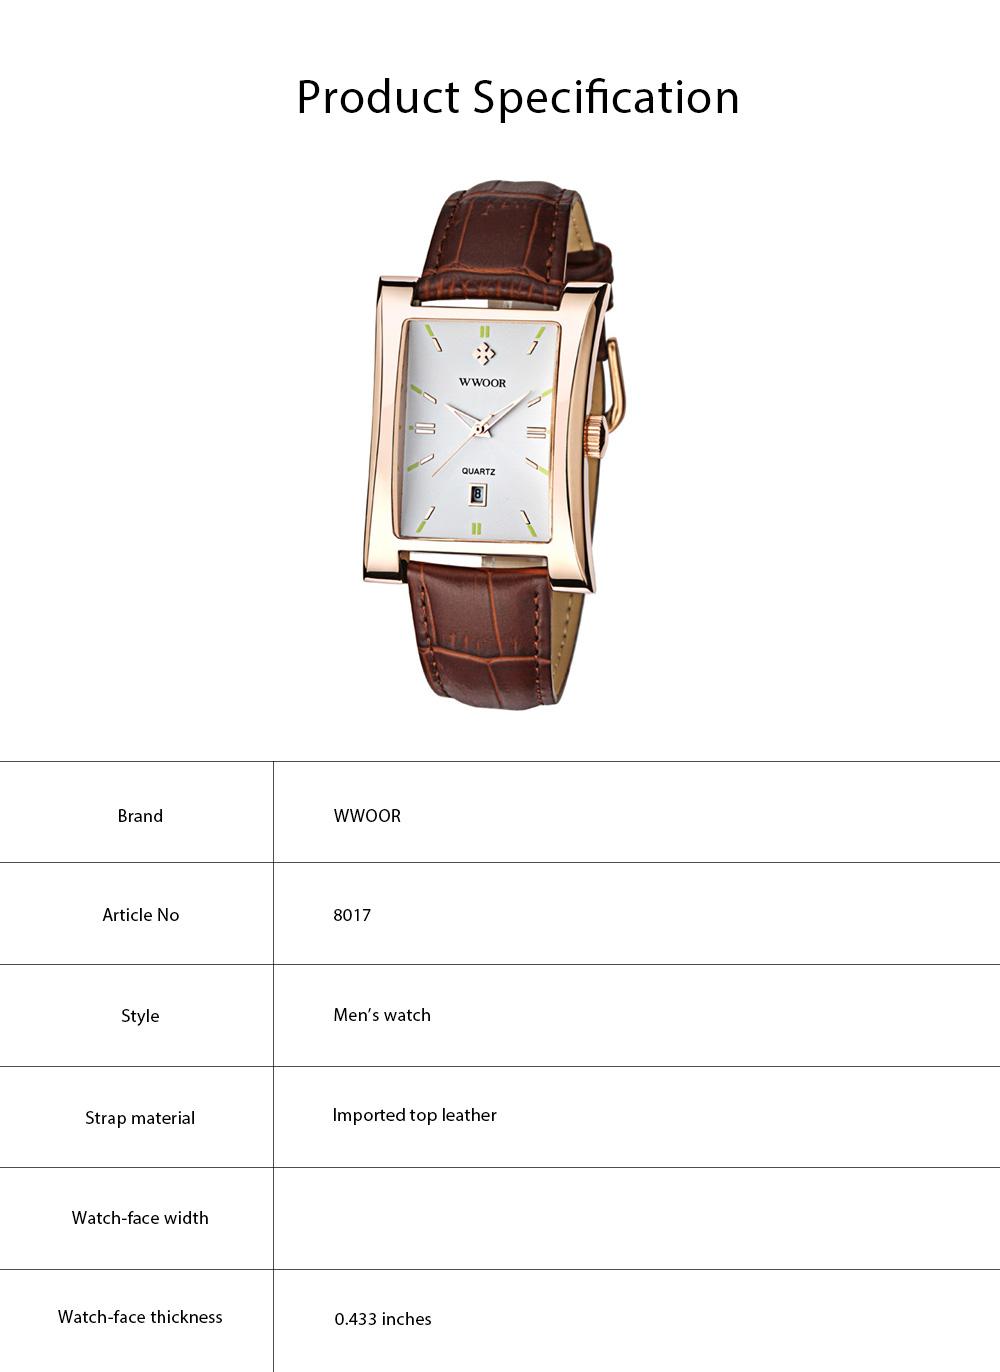 Luxury Wrist Watch for Men, High Quality Leather Strap Watch with Calendar, Waterproof Men's Watch 5